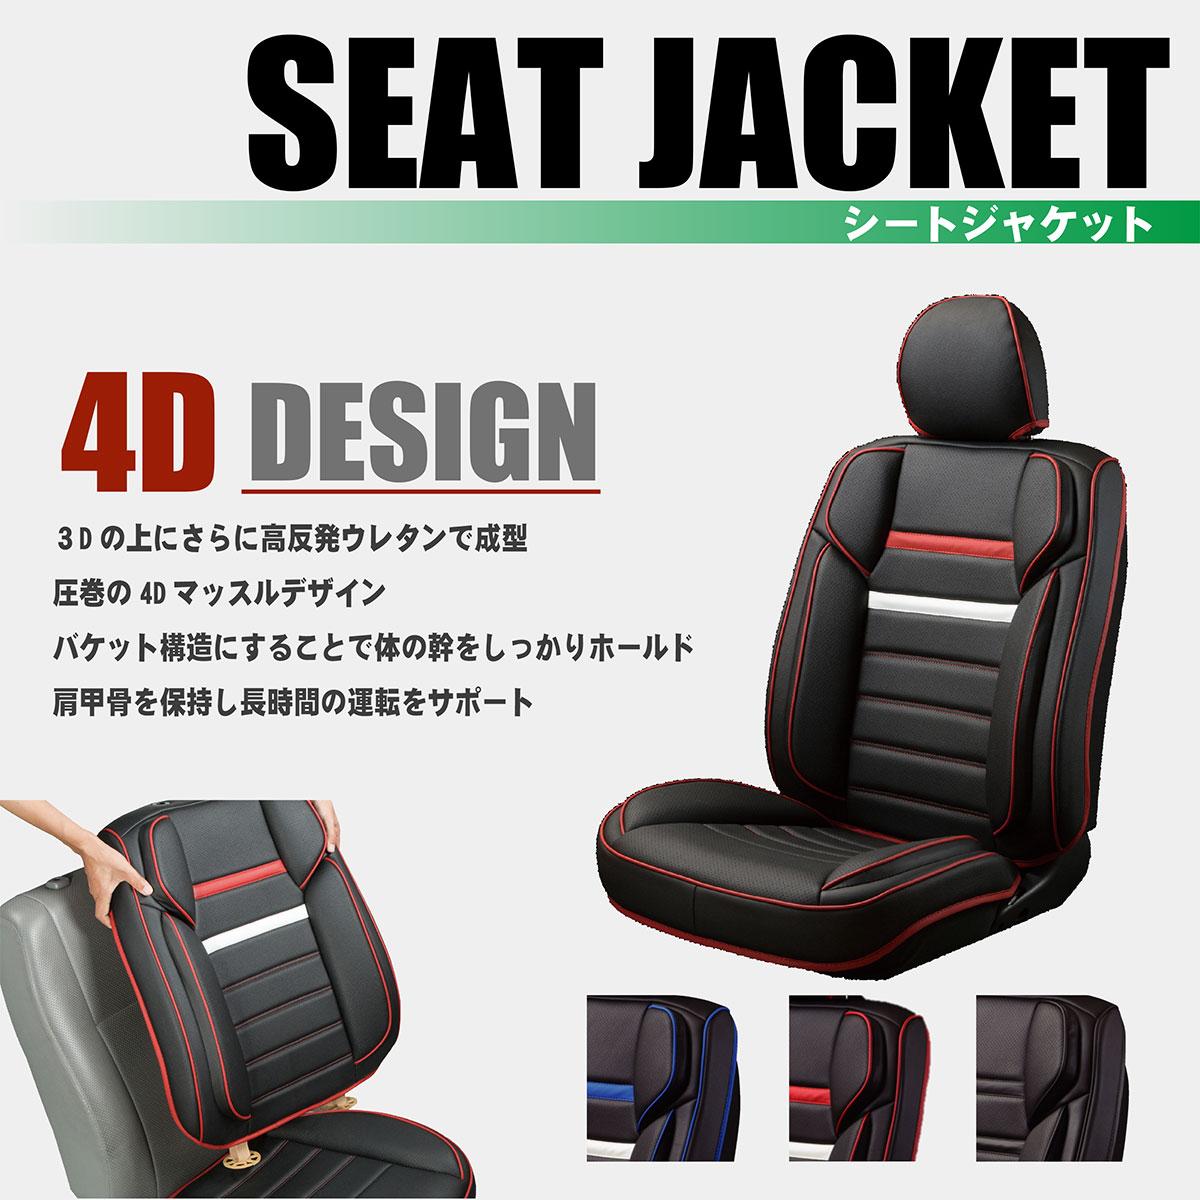 4Dシートジャケット